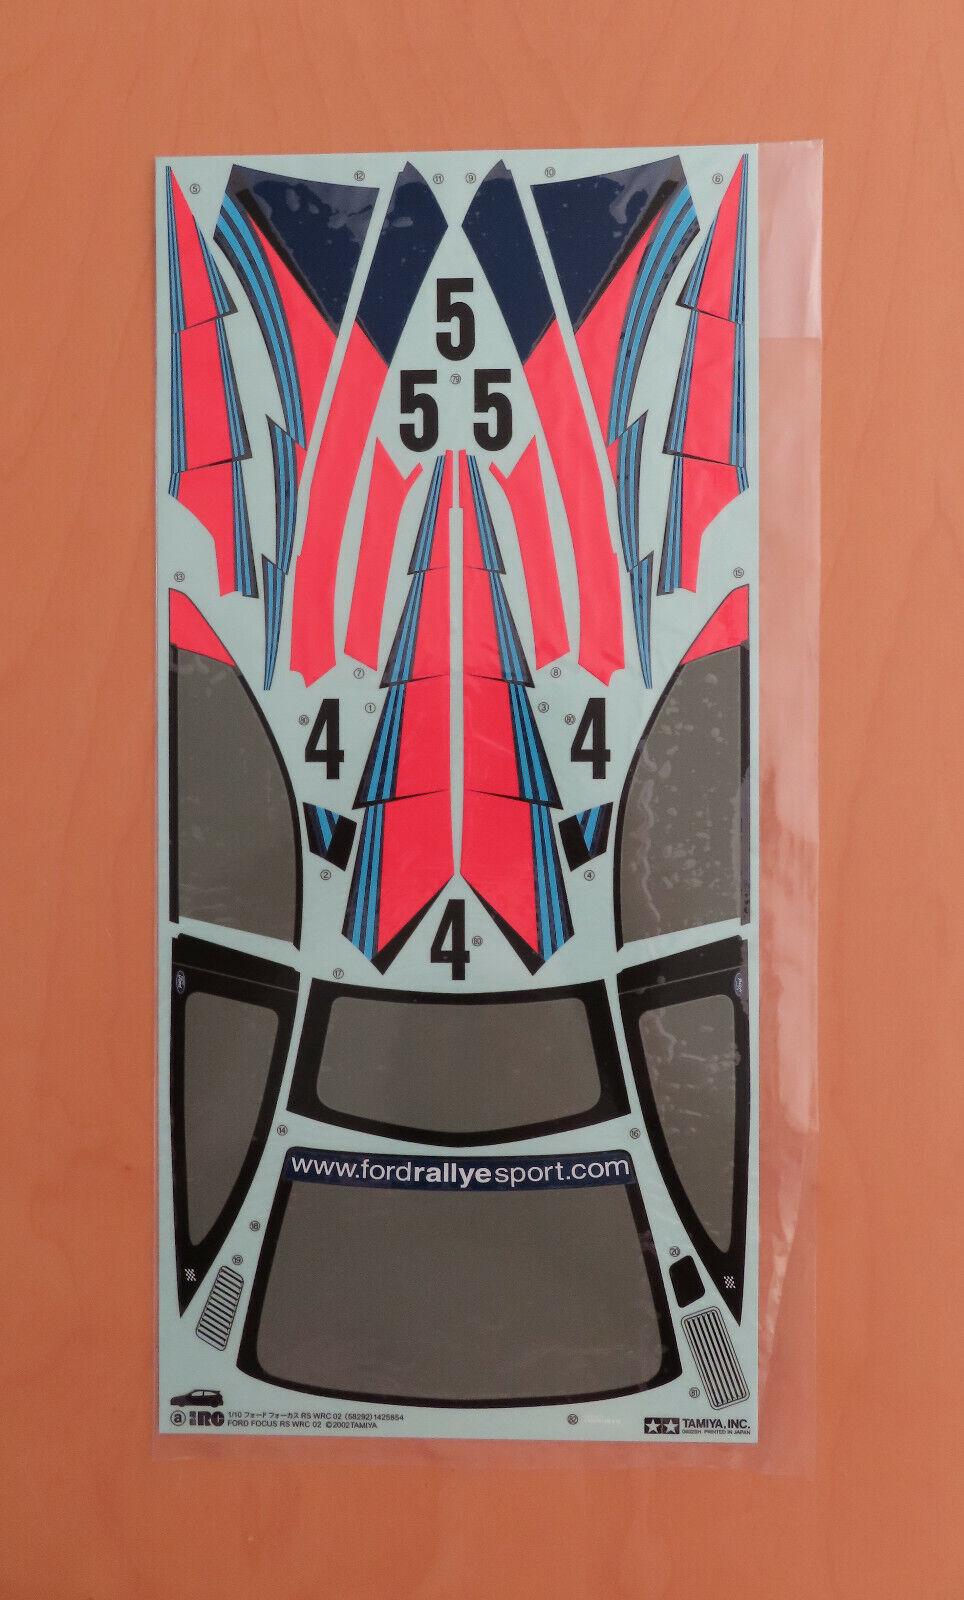 acquista marca RC Tamiya DECAL 58292 FORD FOCUS FOCUS FOCUS WRC'02 NUOVO NIB 2002  alta qualità